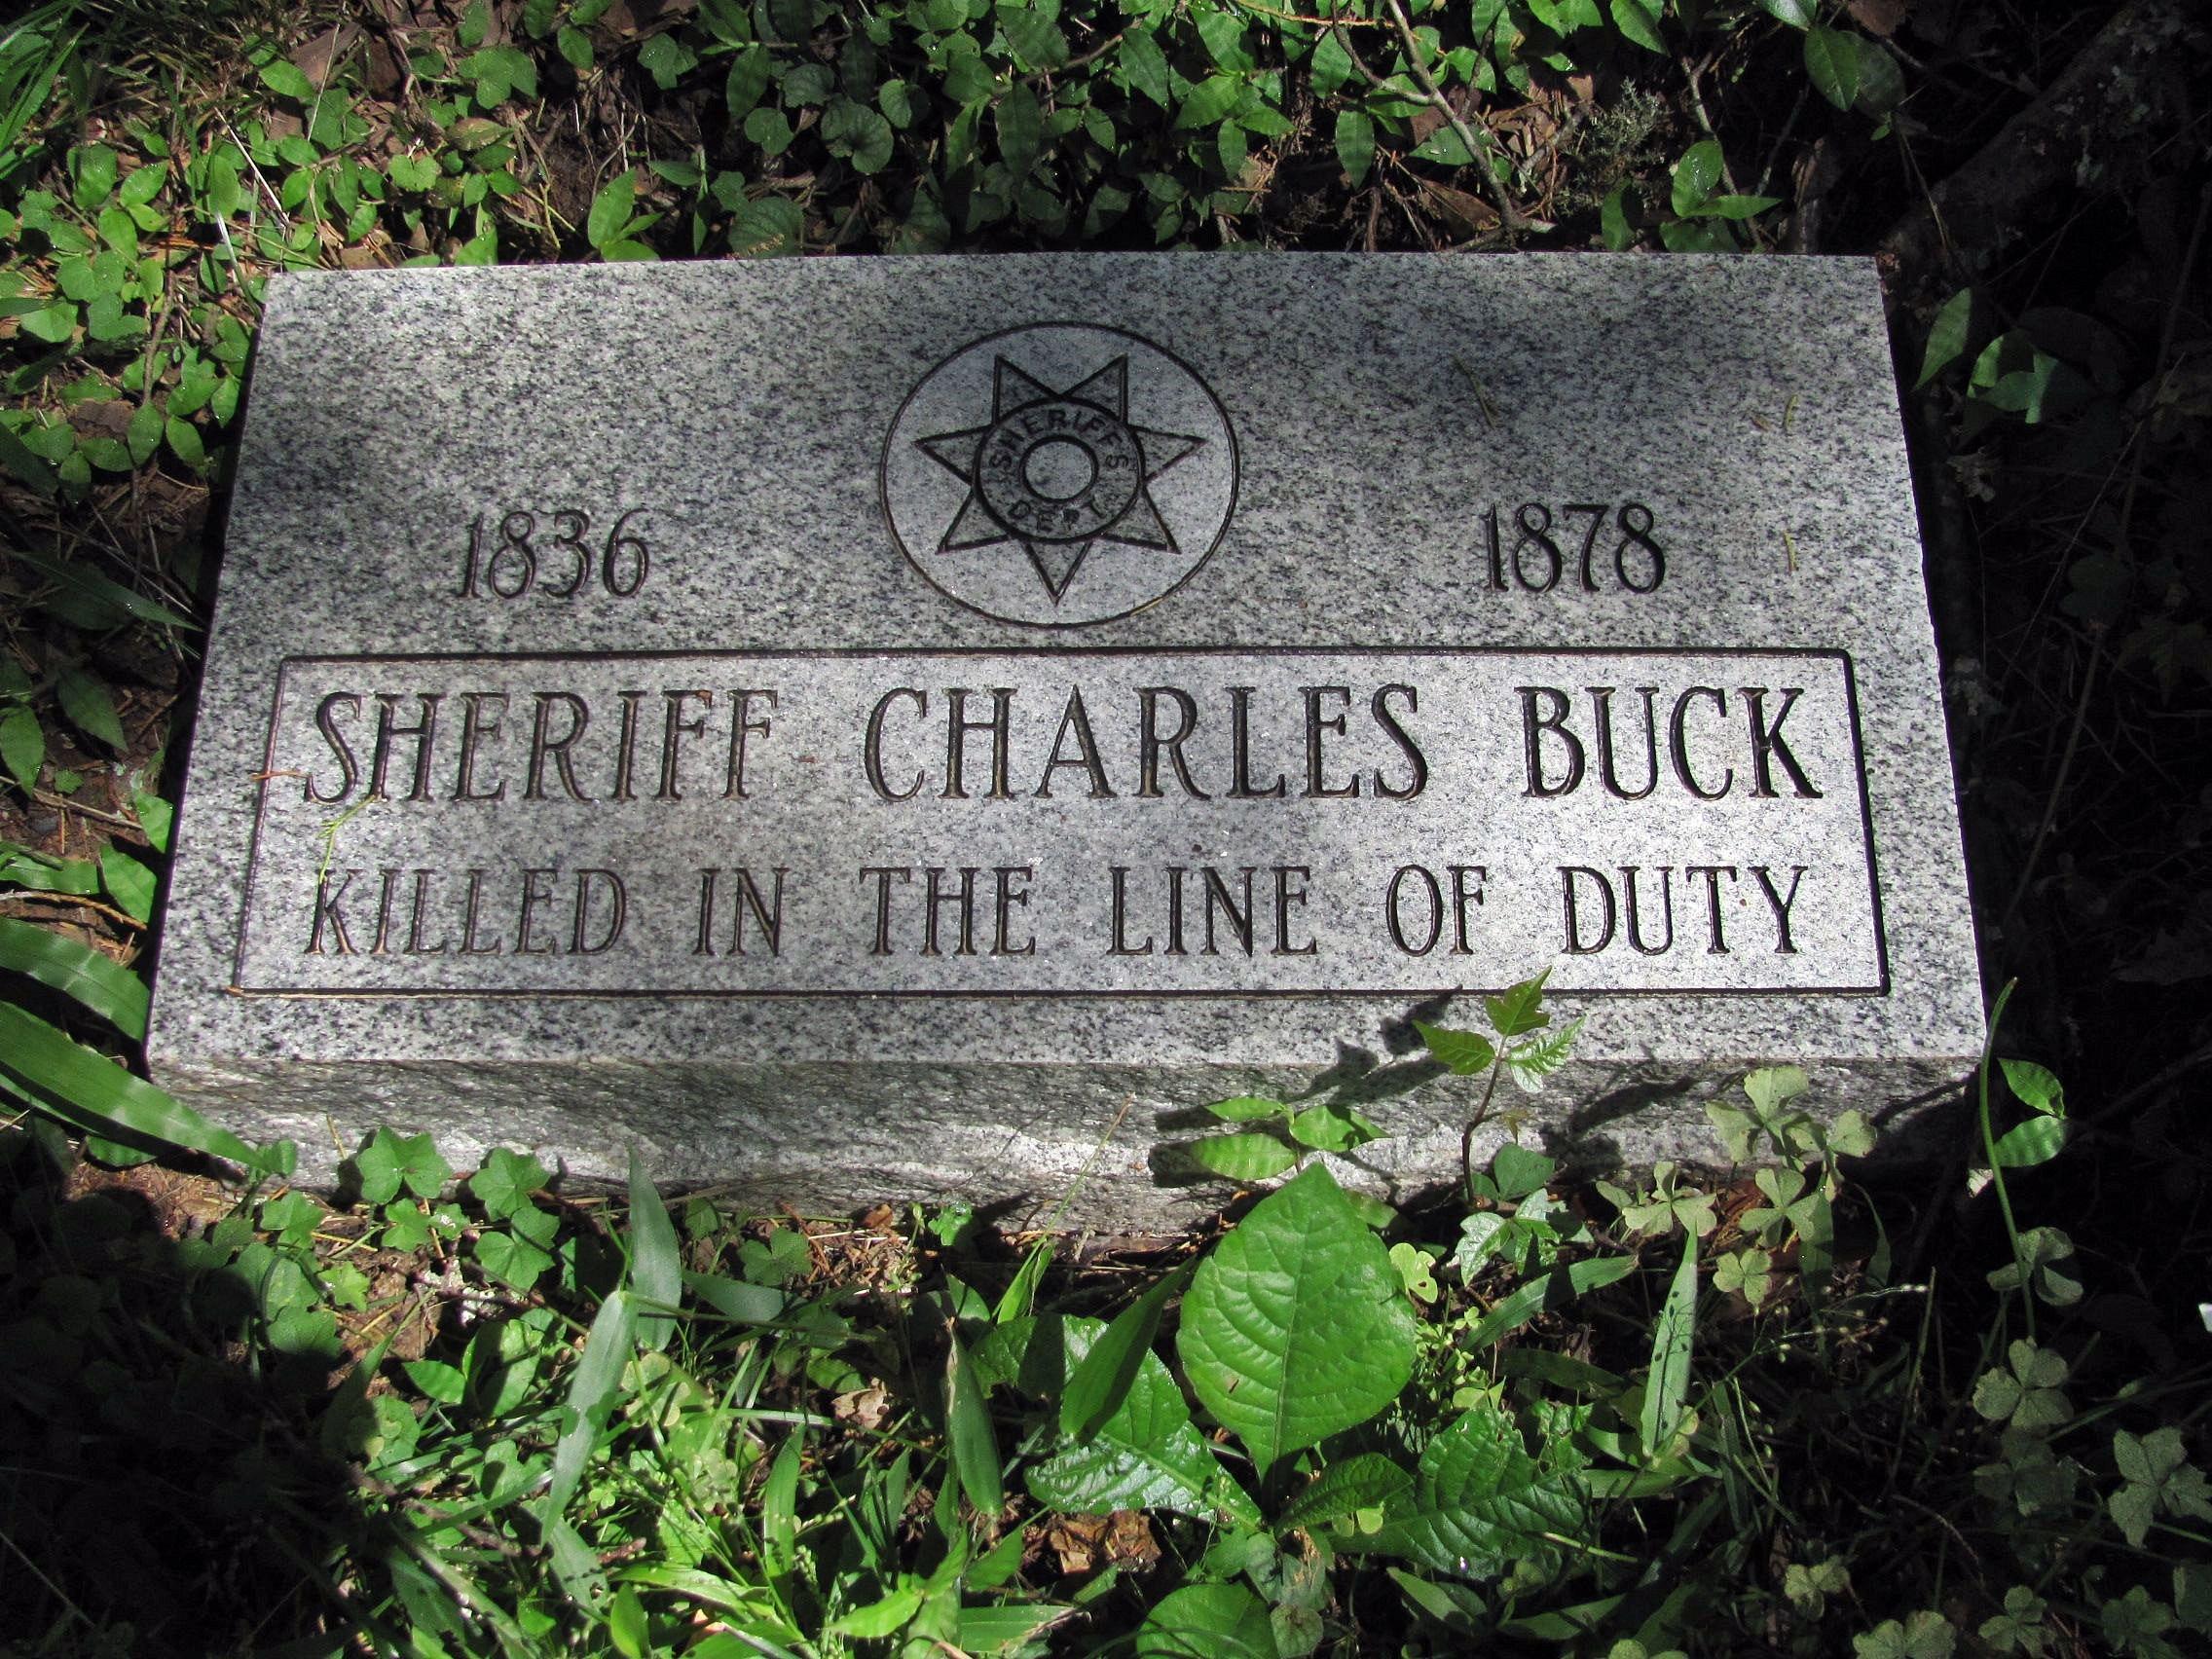 Sheriff Charles Edward Buck   Claiborne County Sheriff's Department, Mississippi